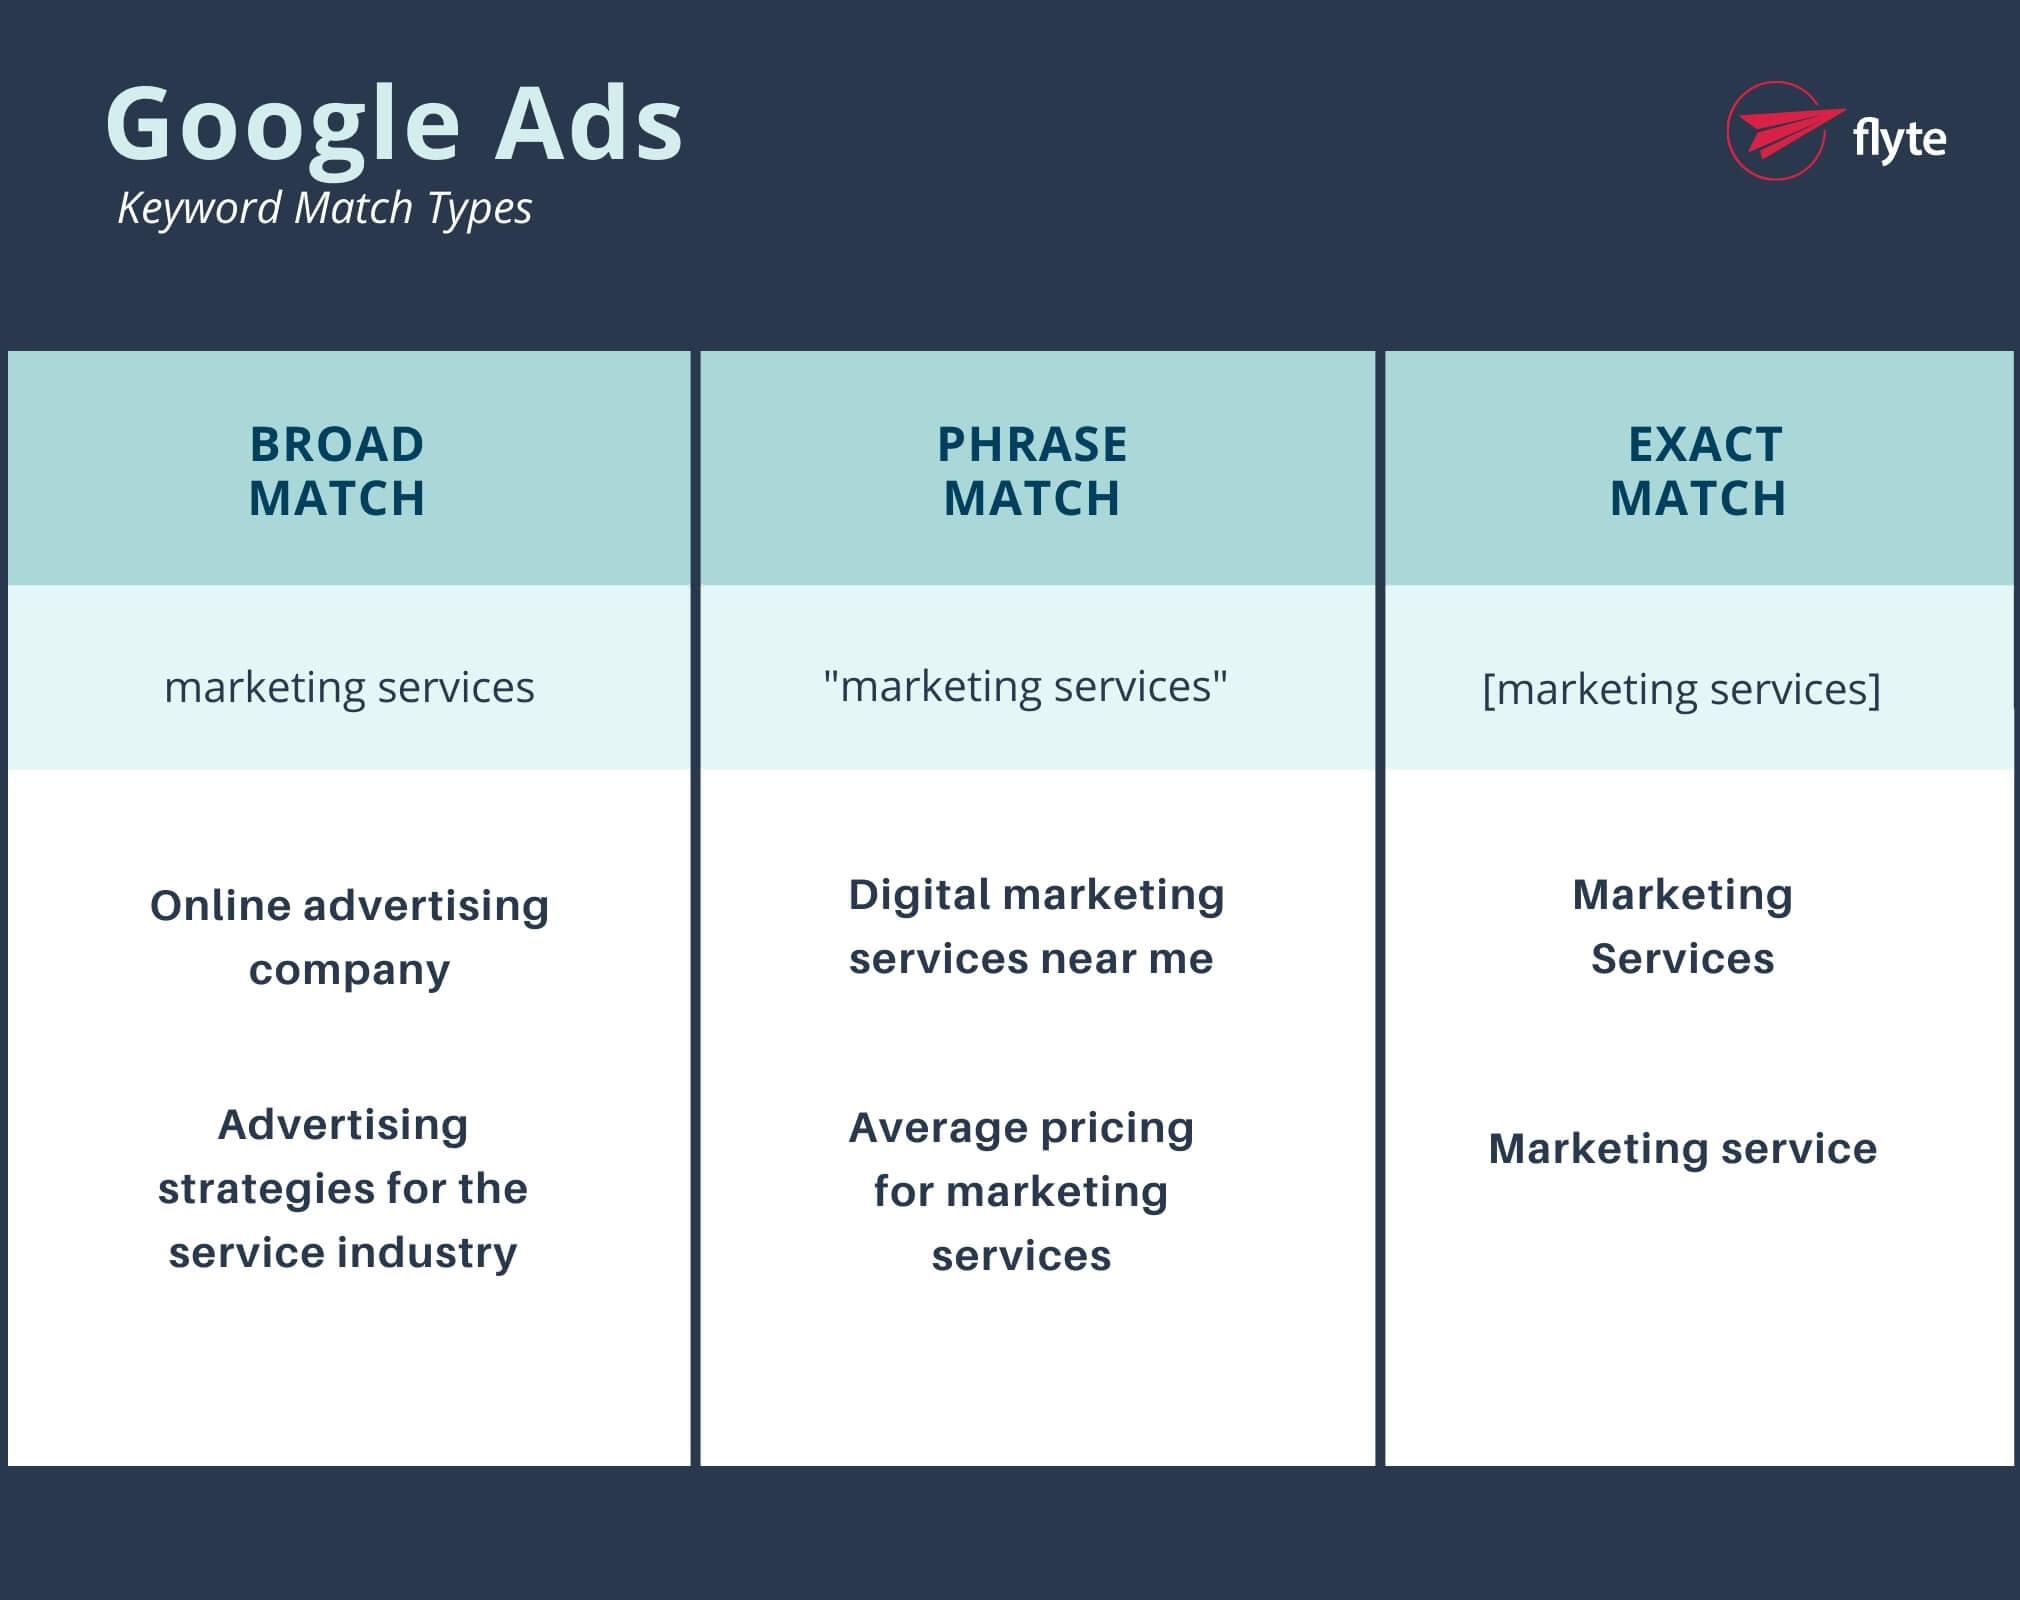 Google Ads Keyword Match Type Infographic